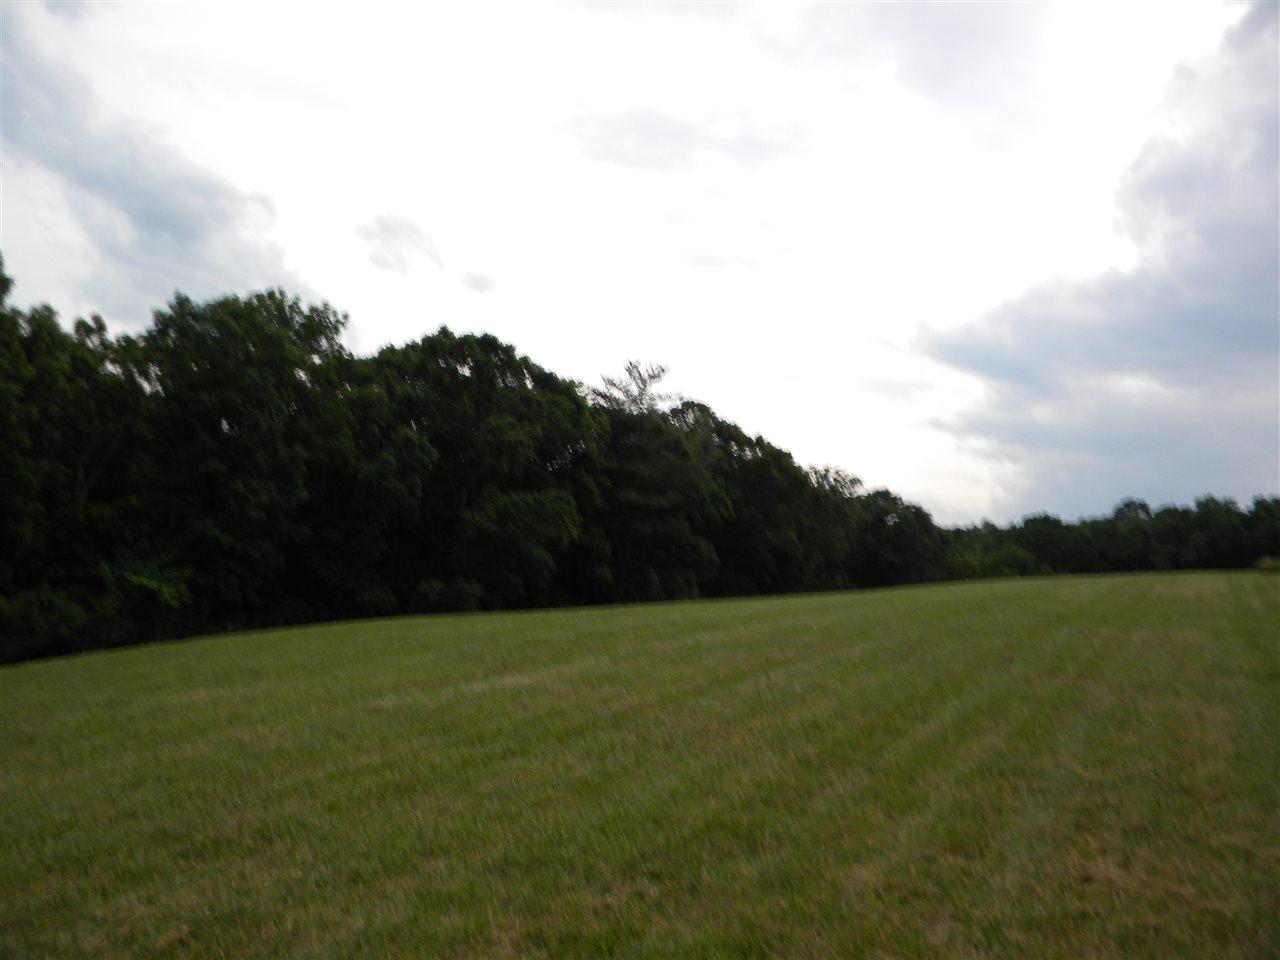 TBD1 Barterbrook Rd, Staunton, VA, 24401